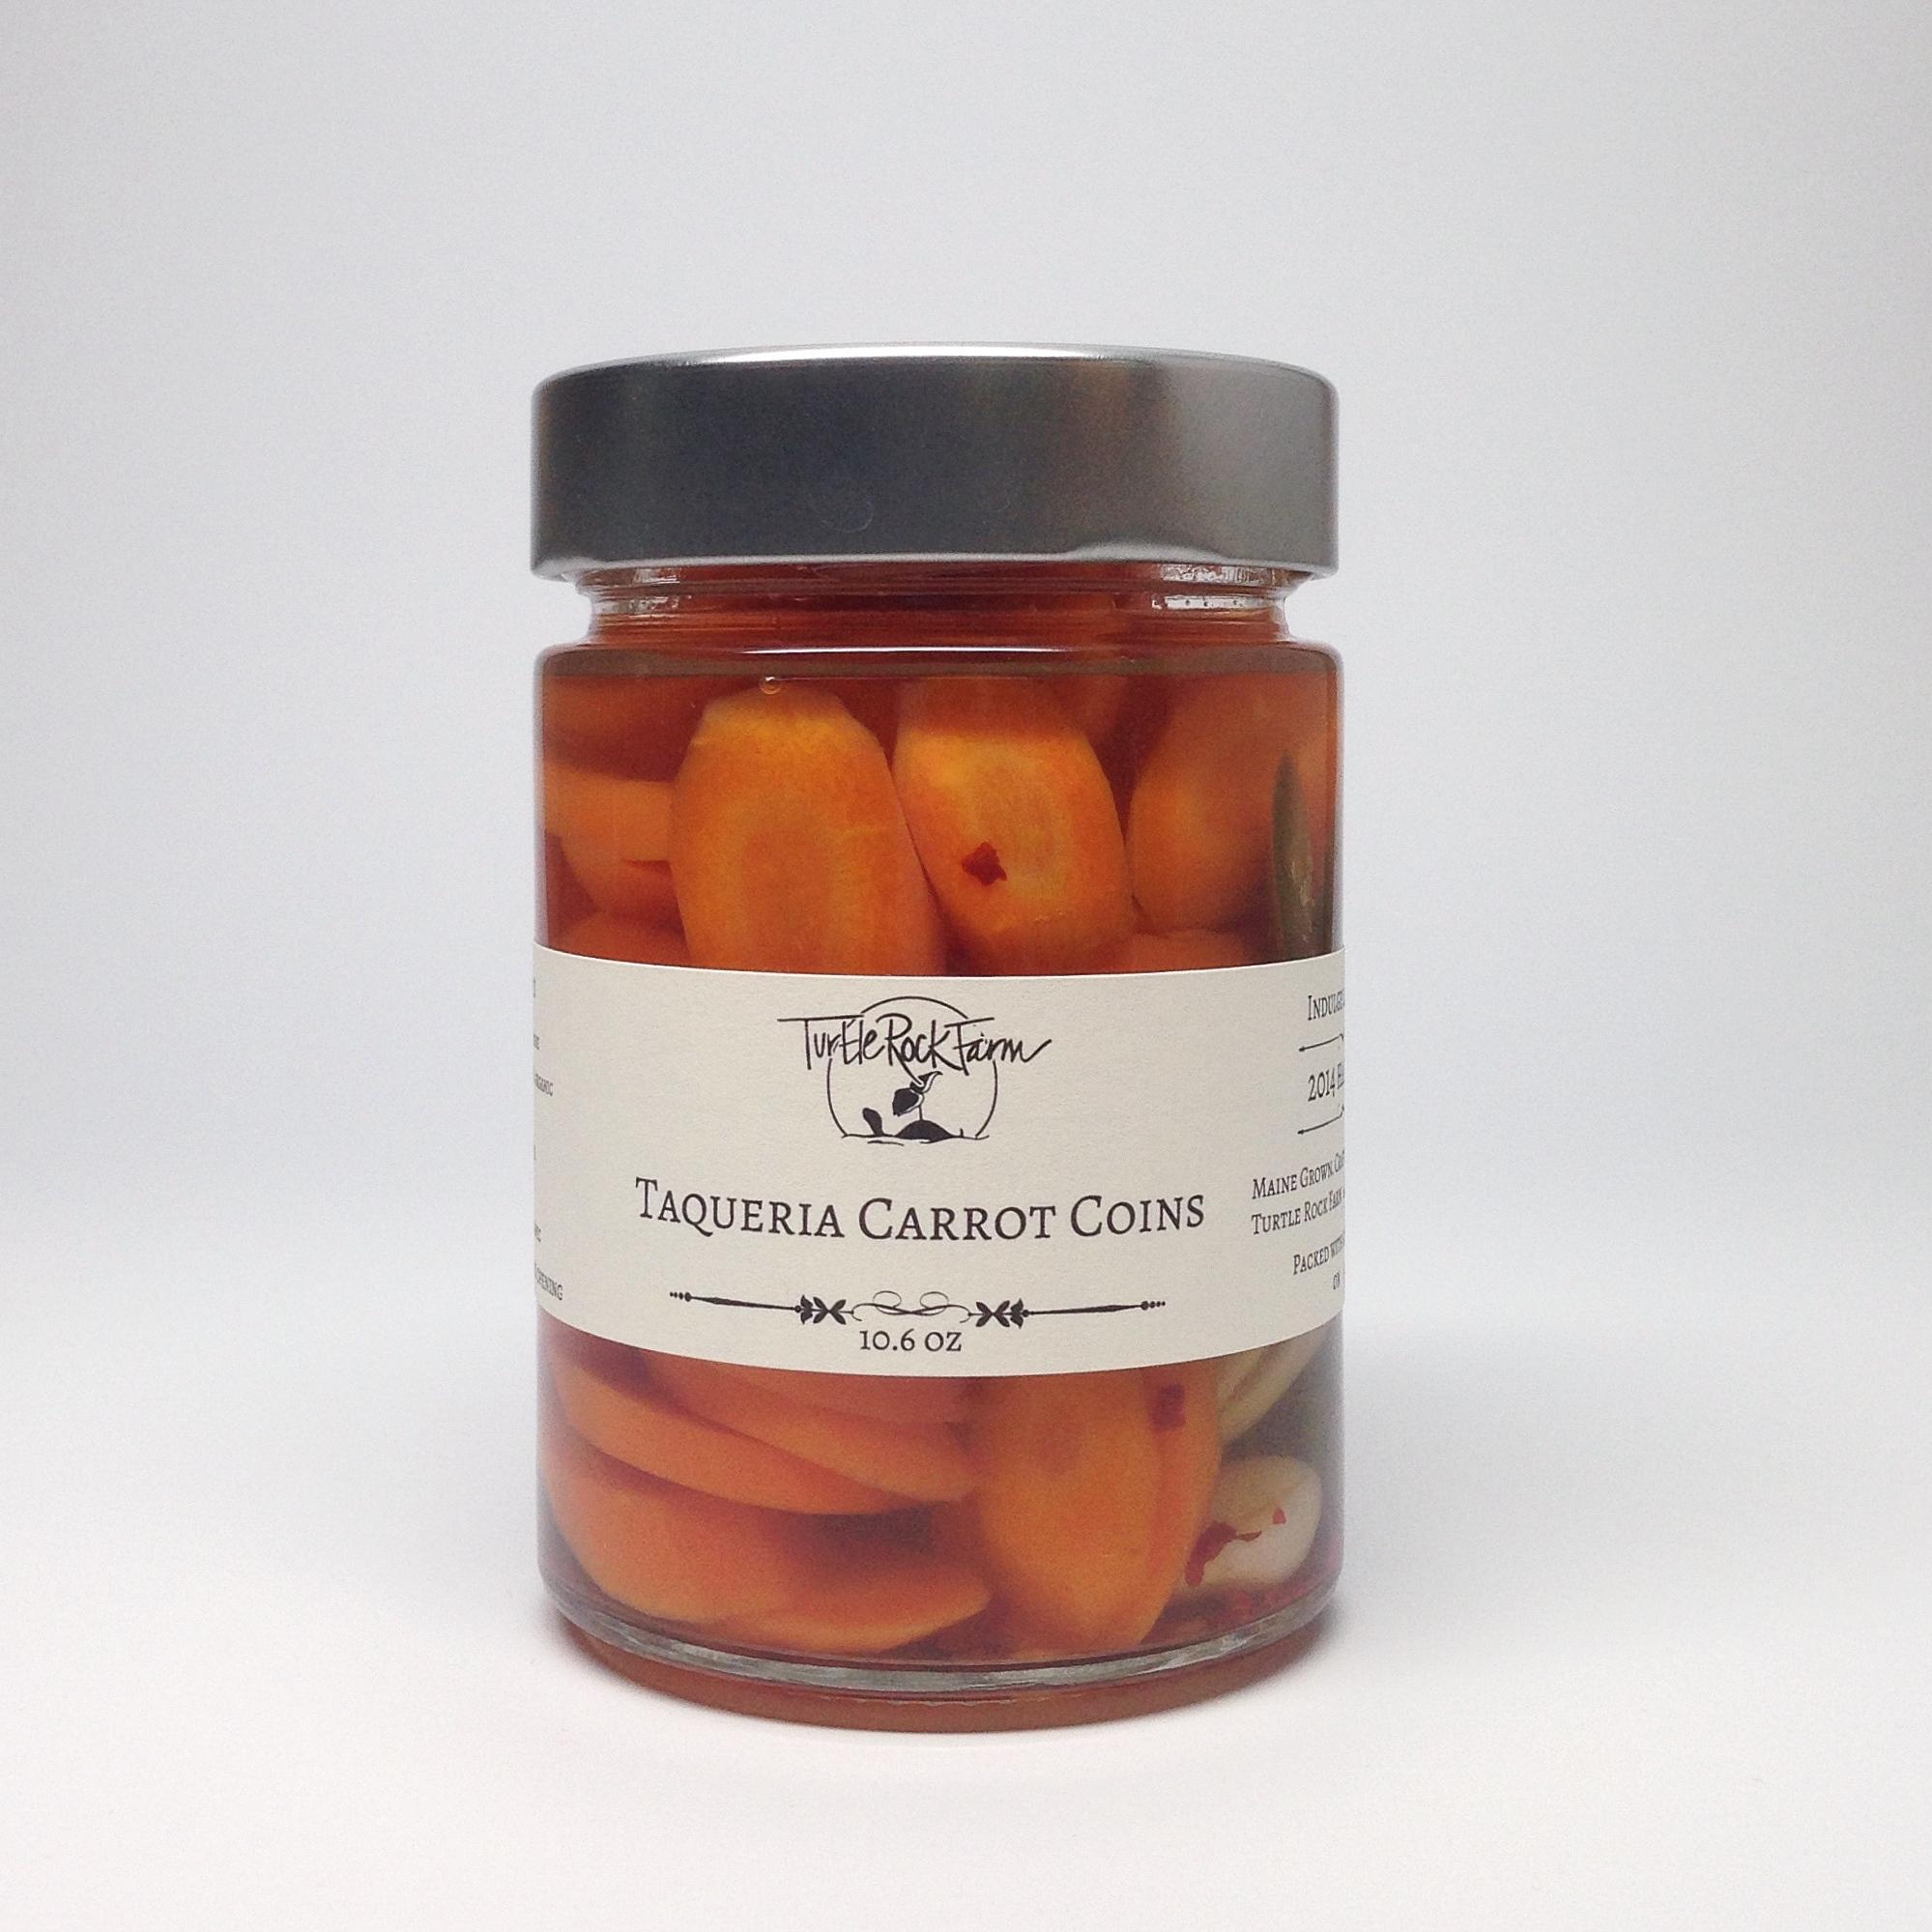 Taqueria Carrot Coins